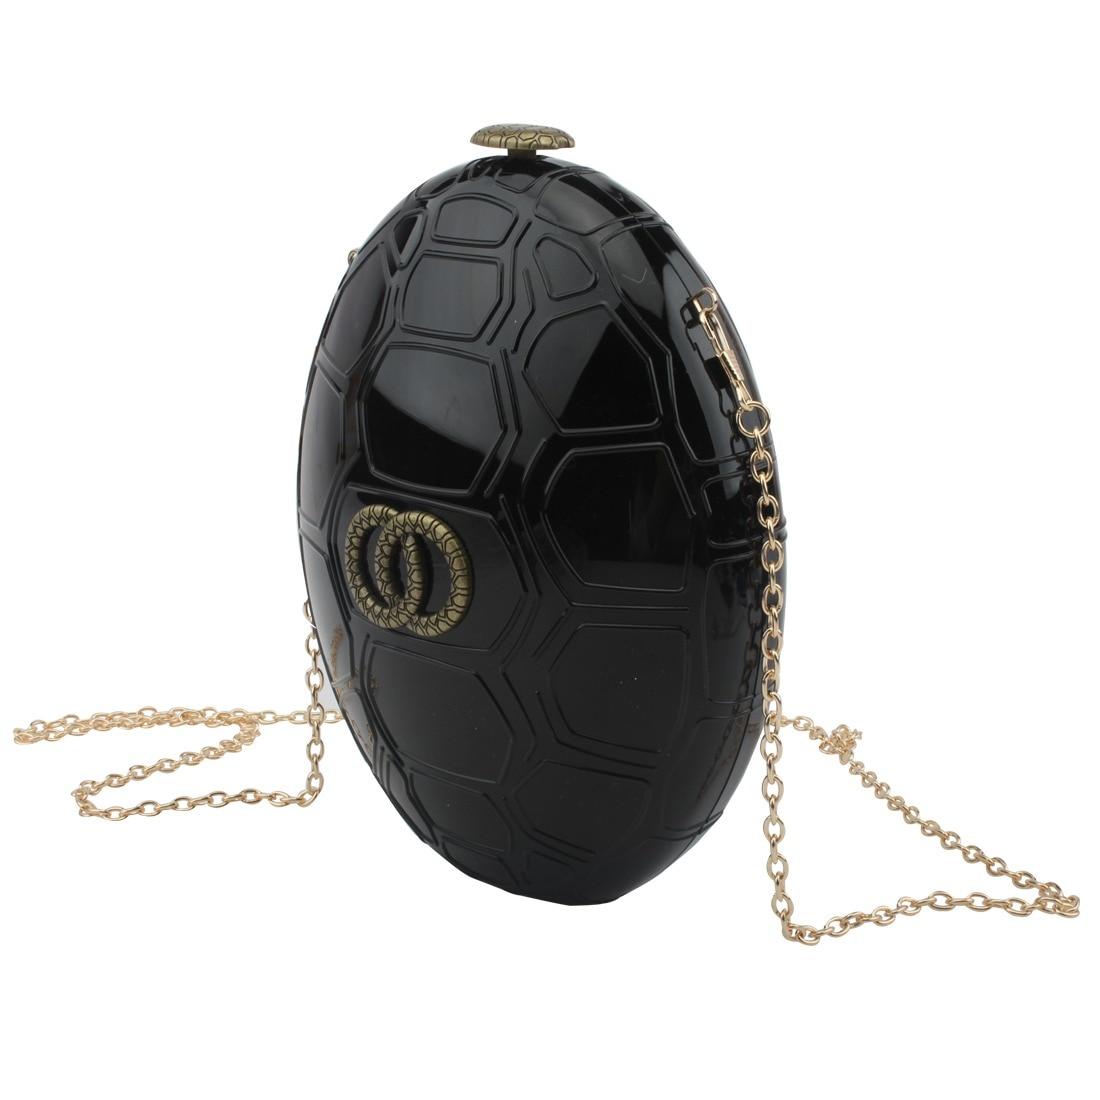 de2be56d0f6 Acrylic tortoise shell bags handbags women brands chain bag evening bags  Shoulder luxury handbags queen clutch